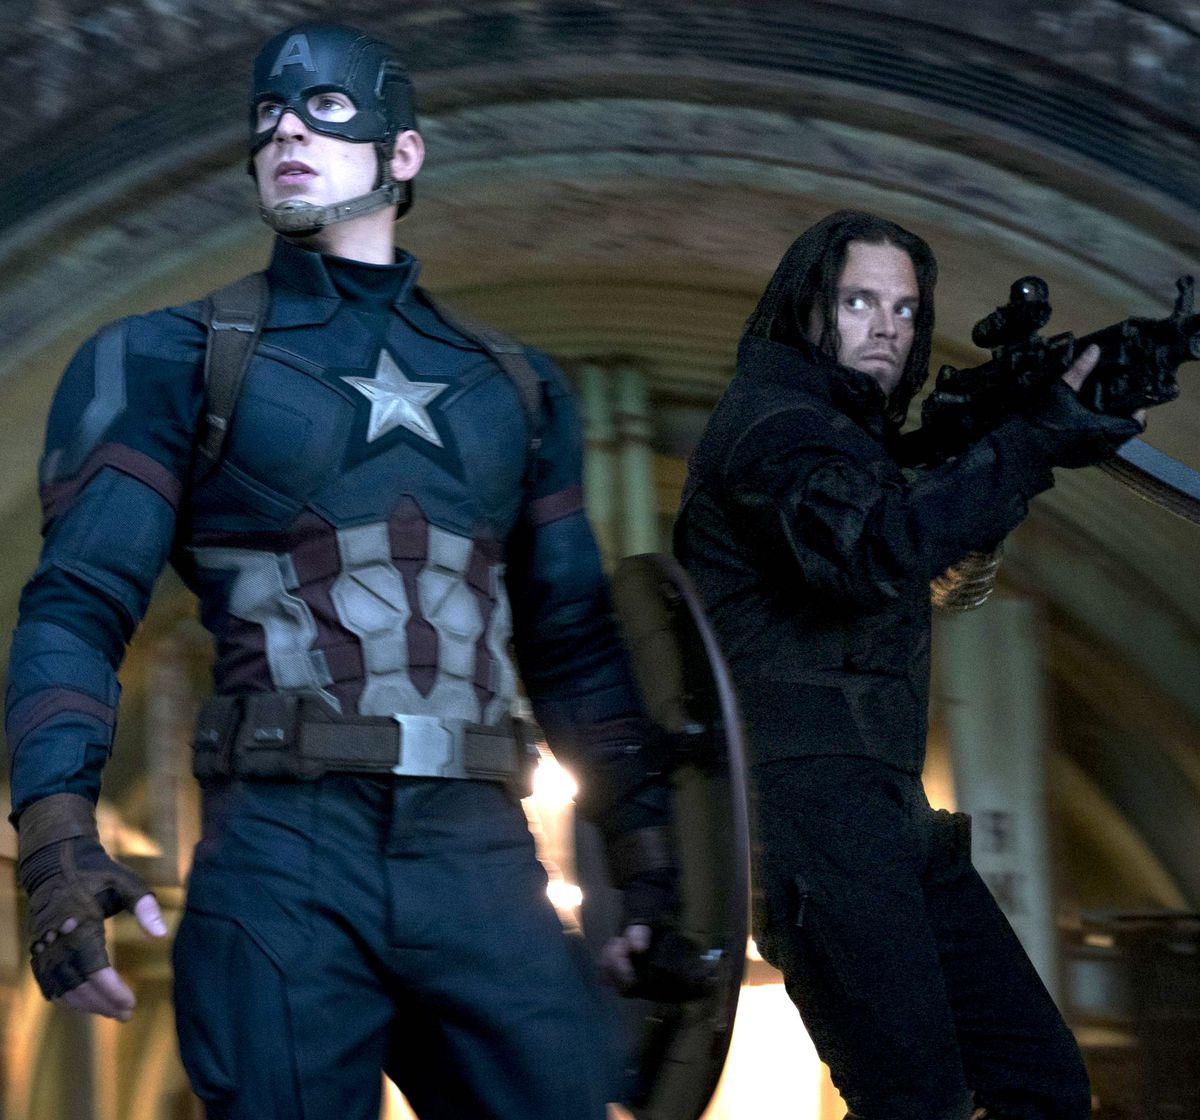 captain america and bucky in captain america civil war